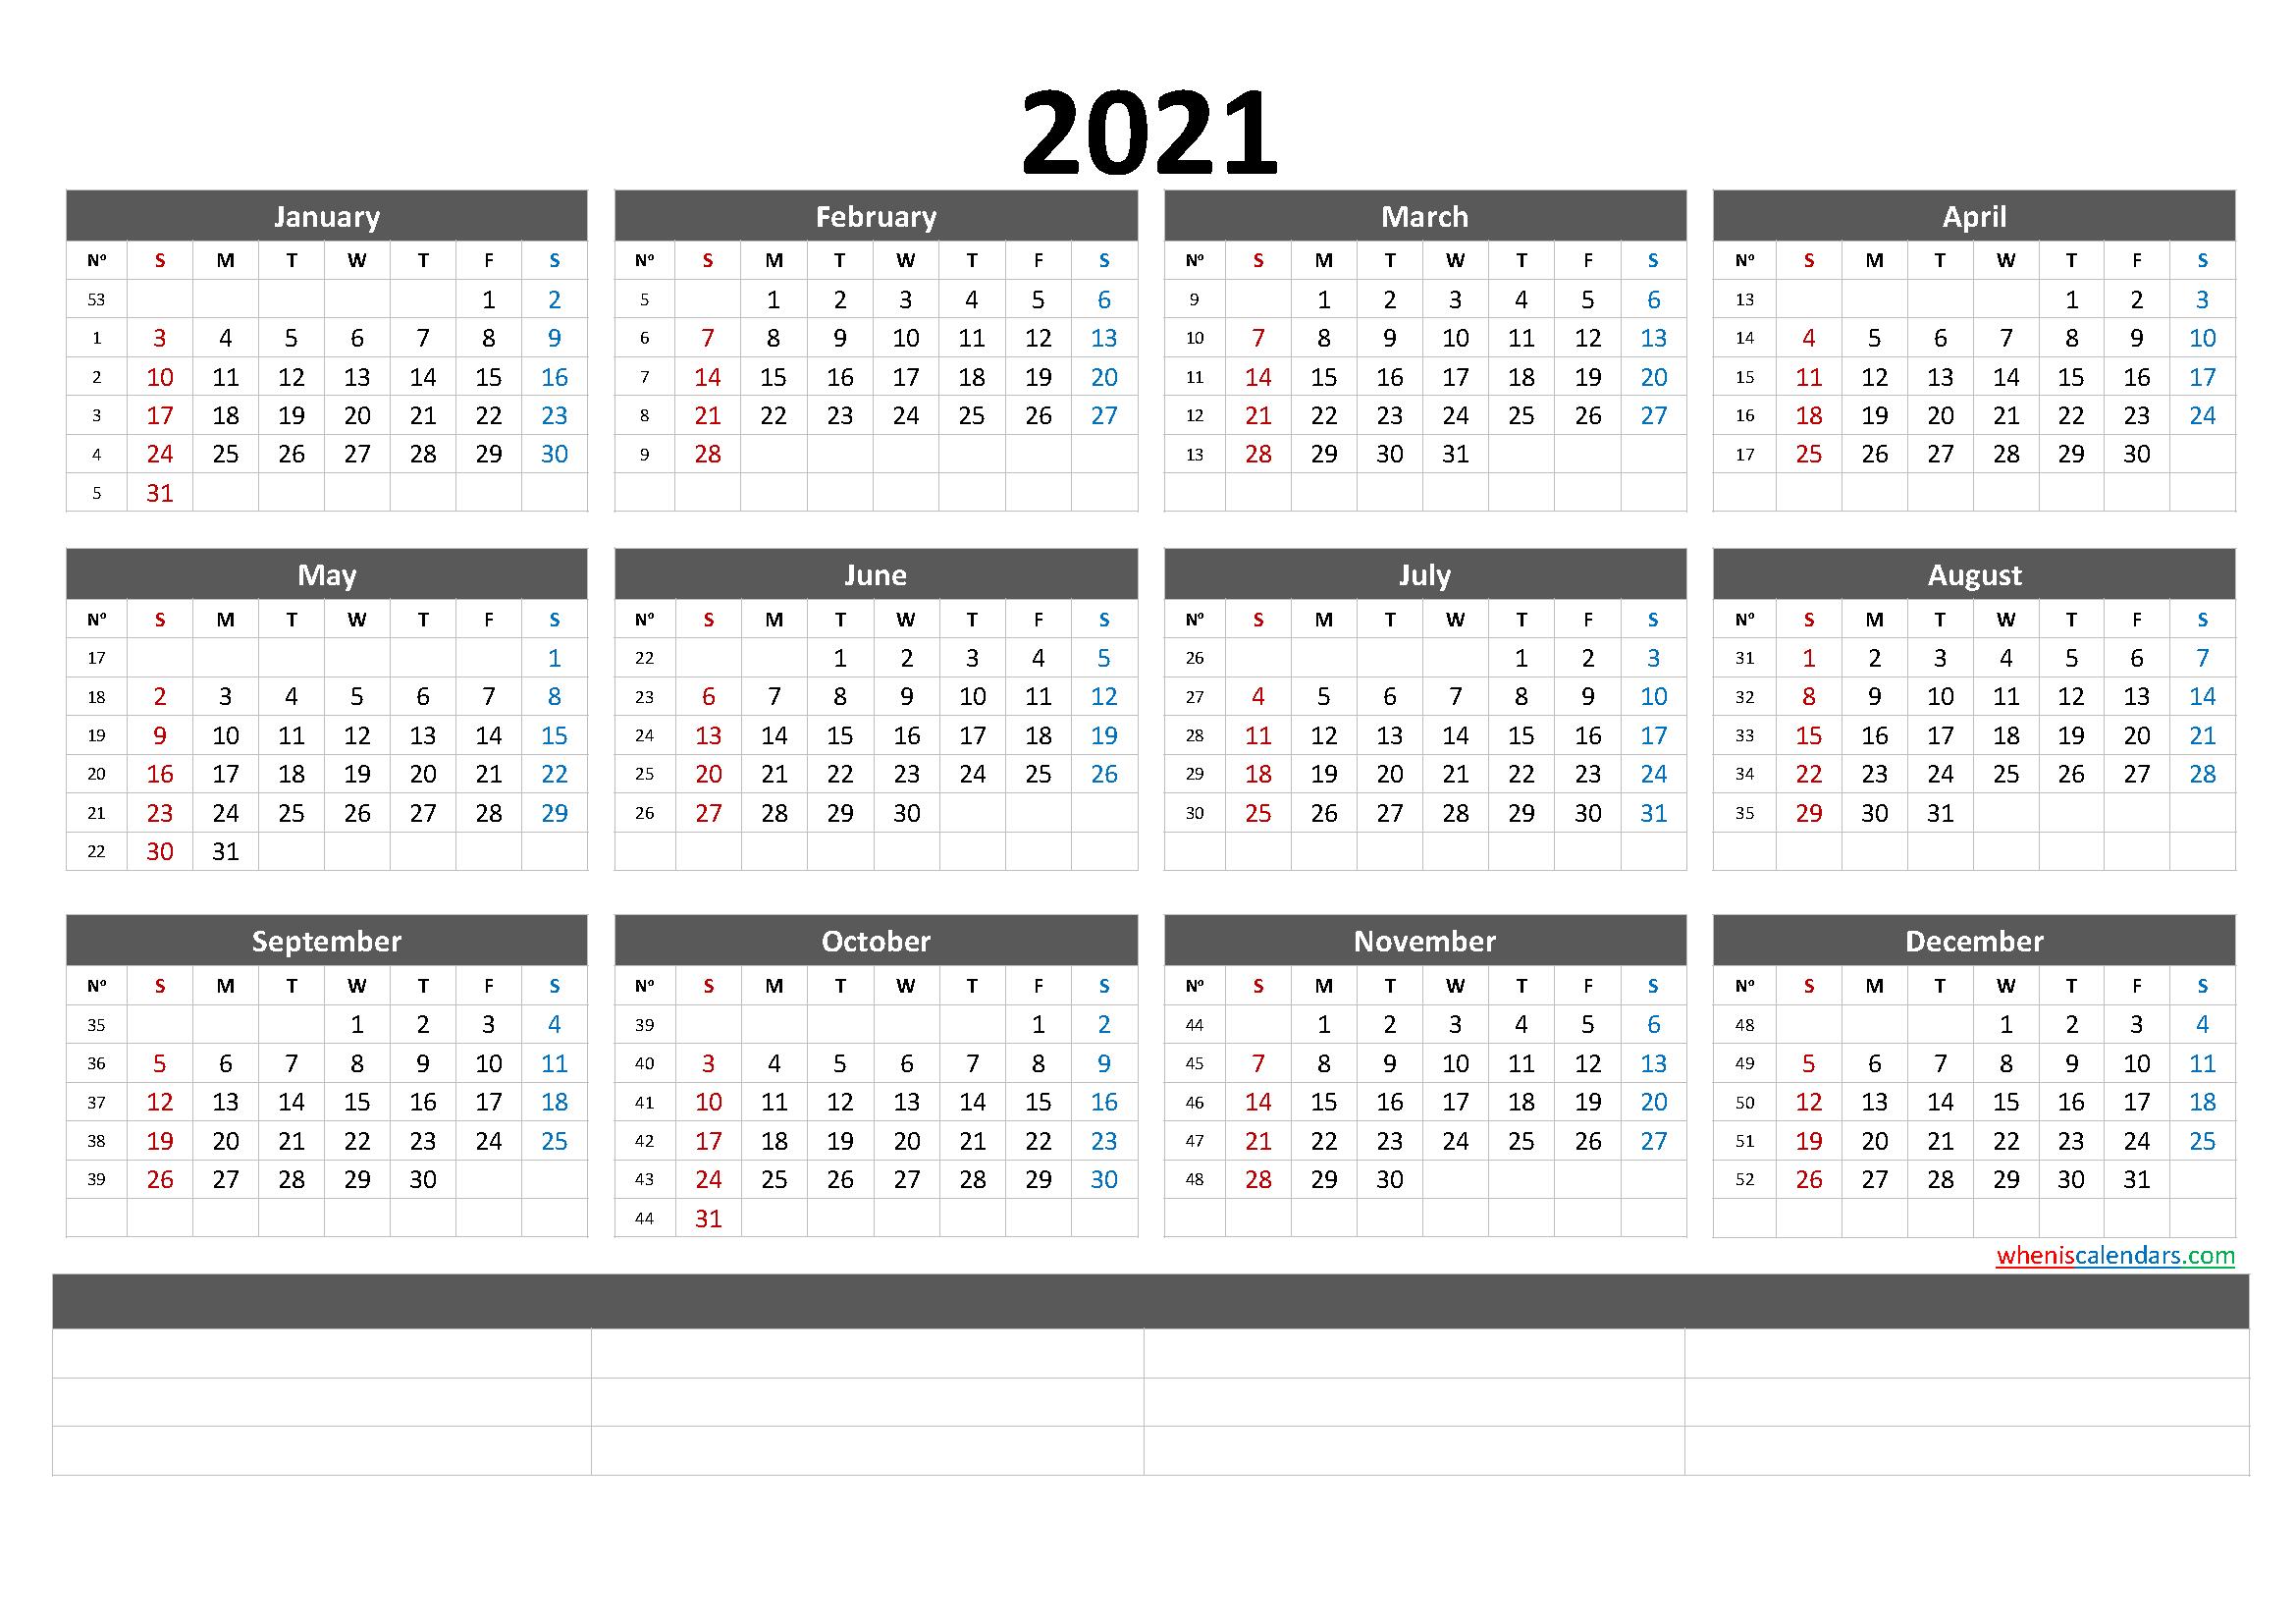 Free Printable 2021 Calendarmonth (6 Templates) – Free